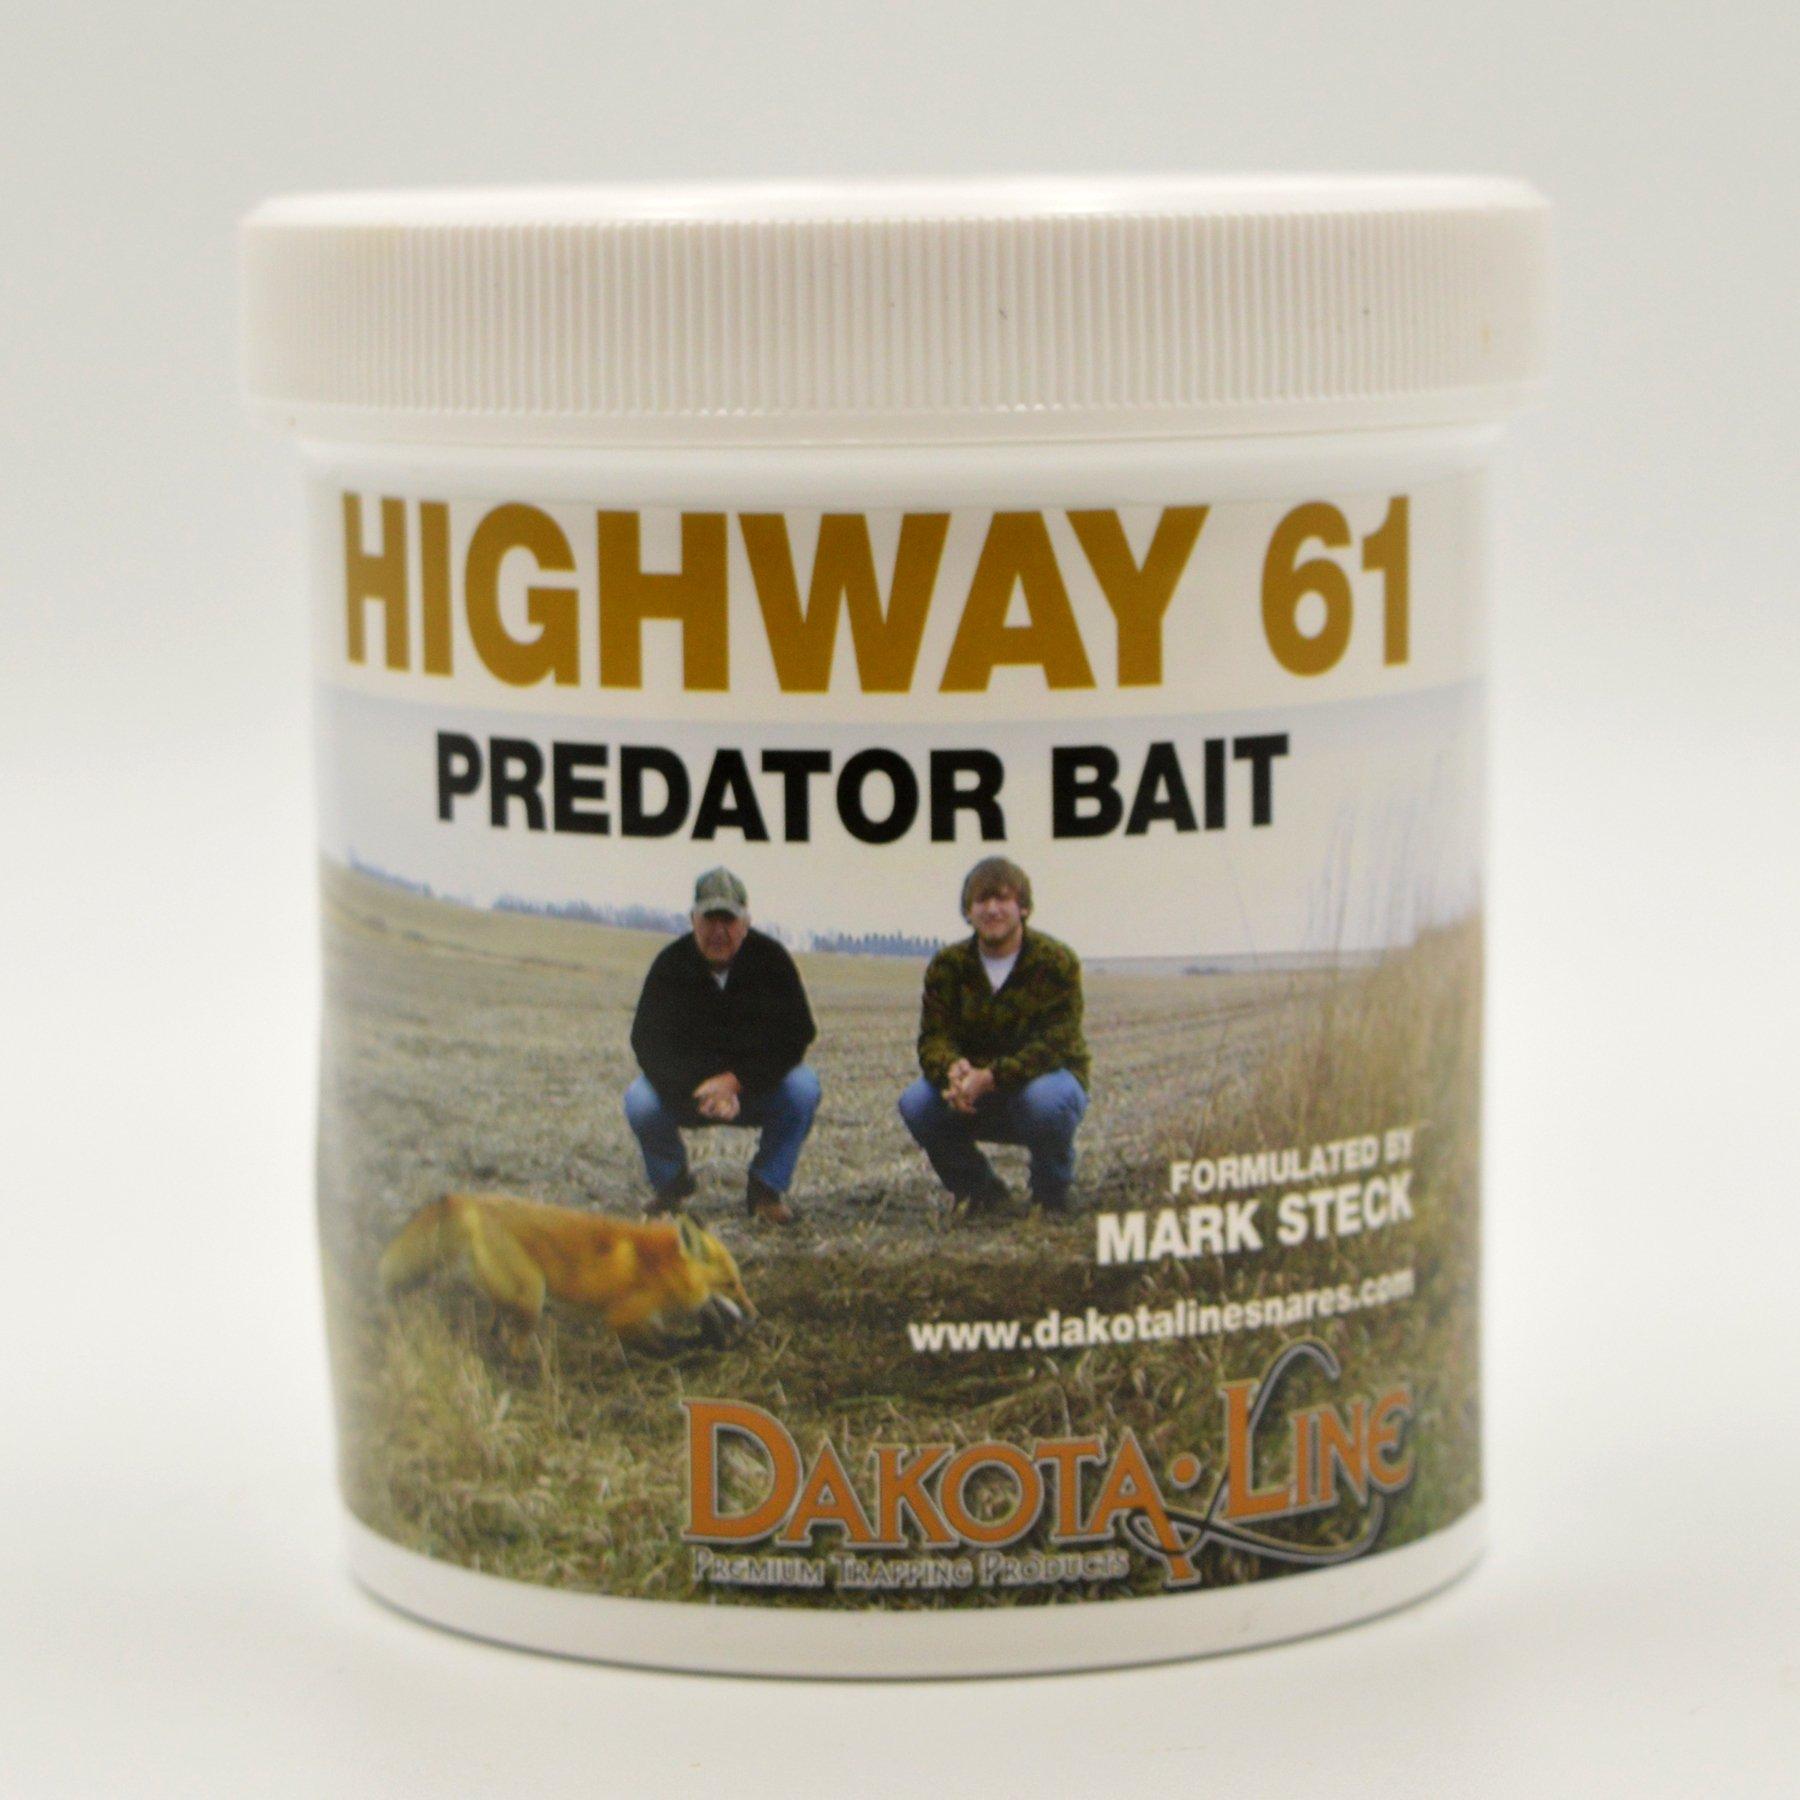 1 - Pint HIGHWAY 61 Predator Bait by DakotaLine (Image #1)